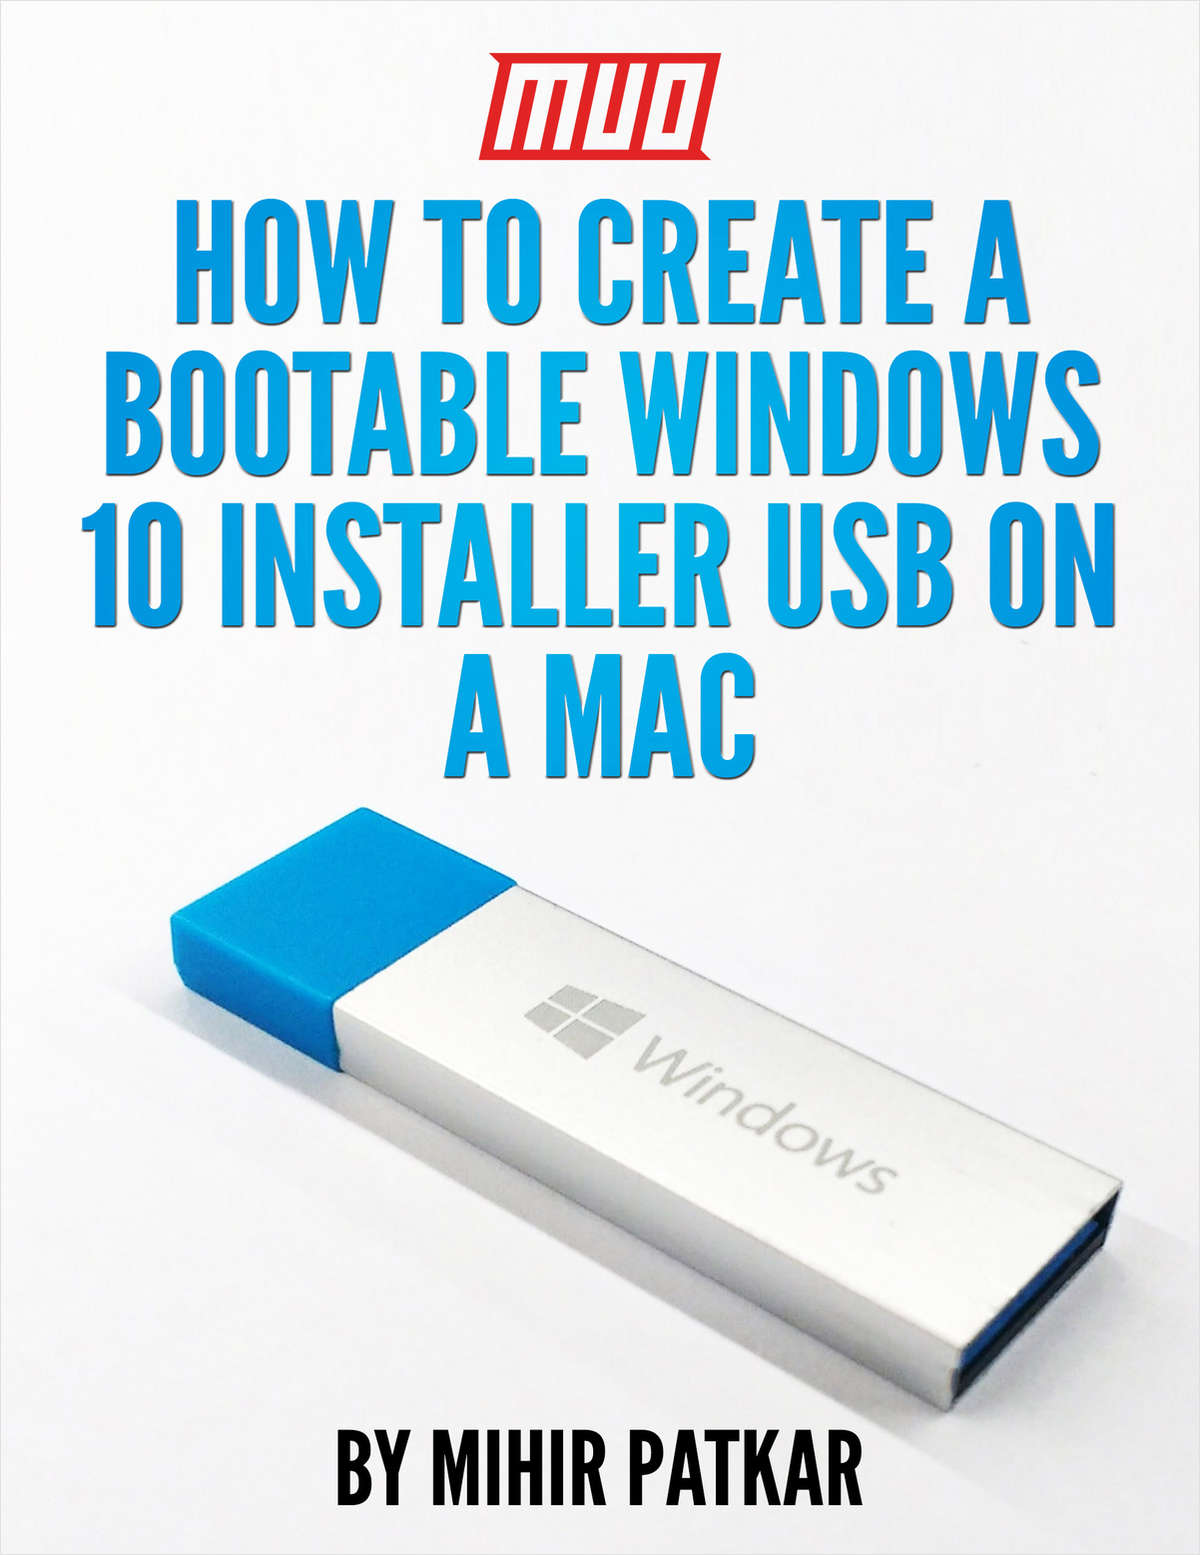 How to Create a Bootable Windows 10 Installer USB on a Mac